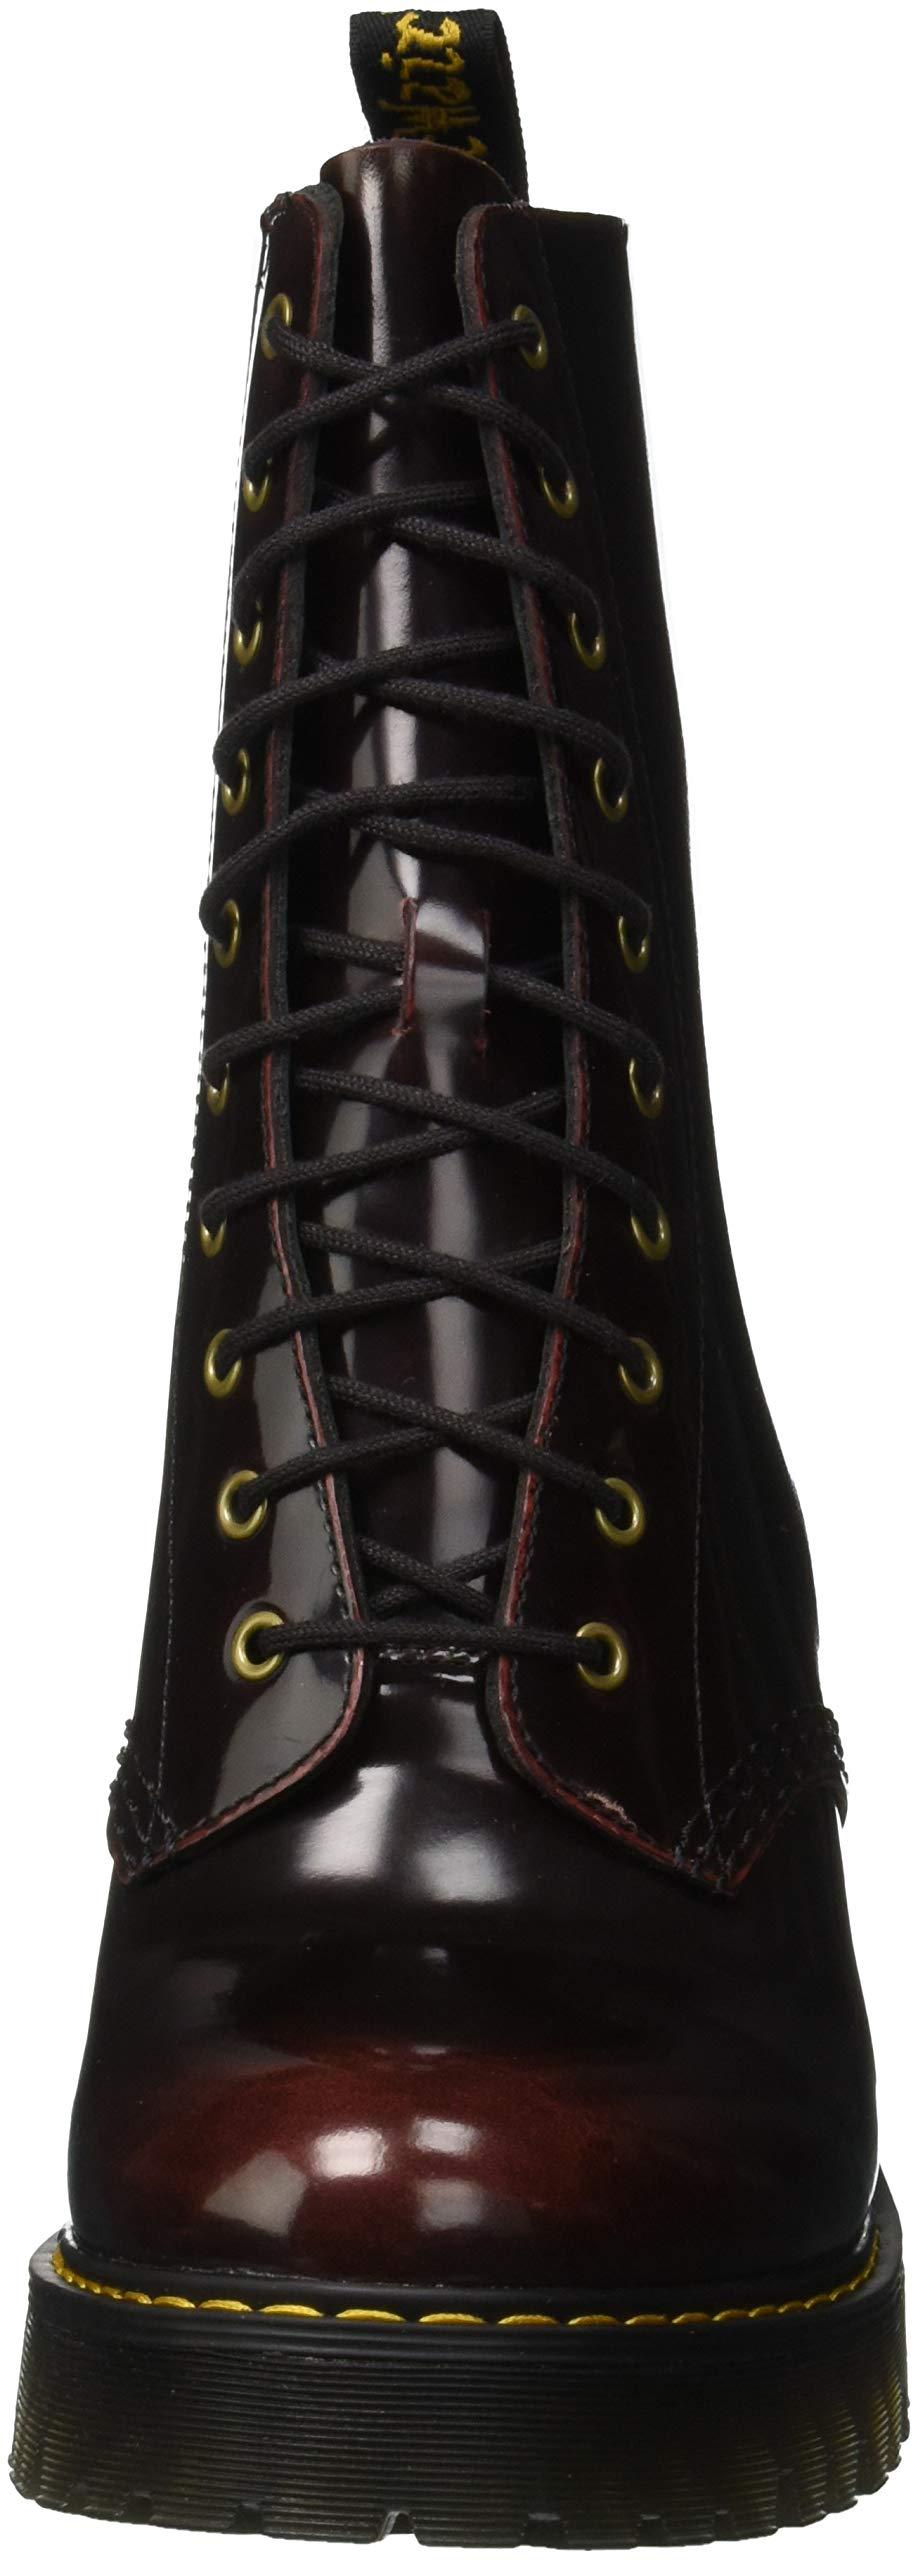 Dr. Martens Women's Kendra Fashion Boot, Cherry Re Choose SZcolor